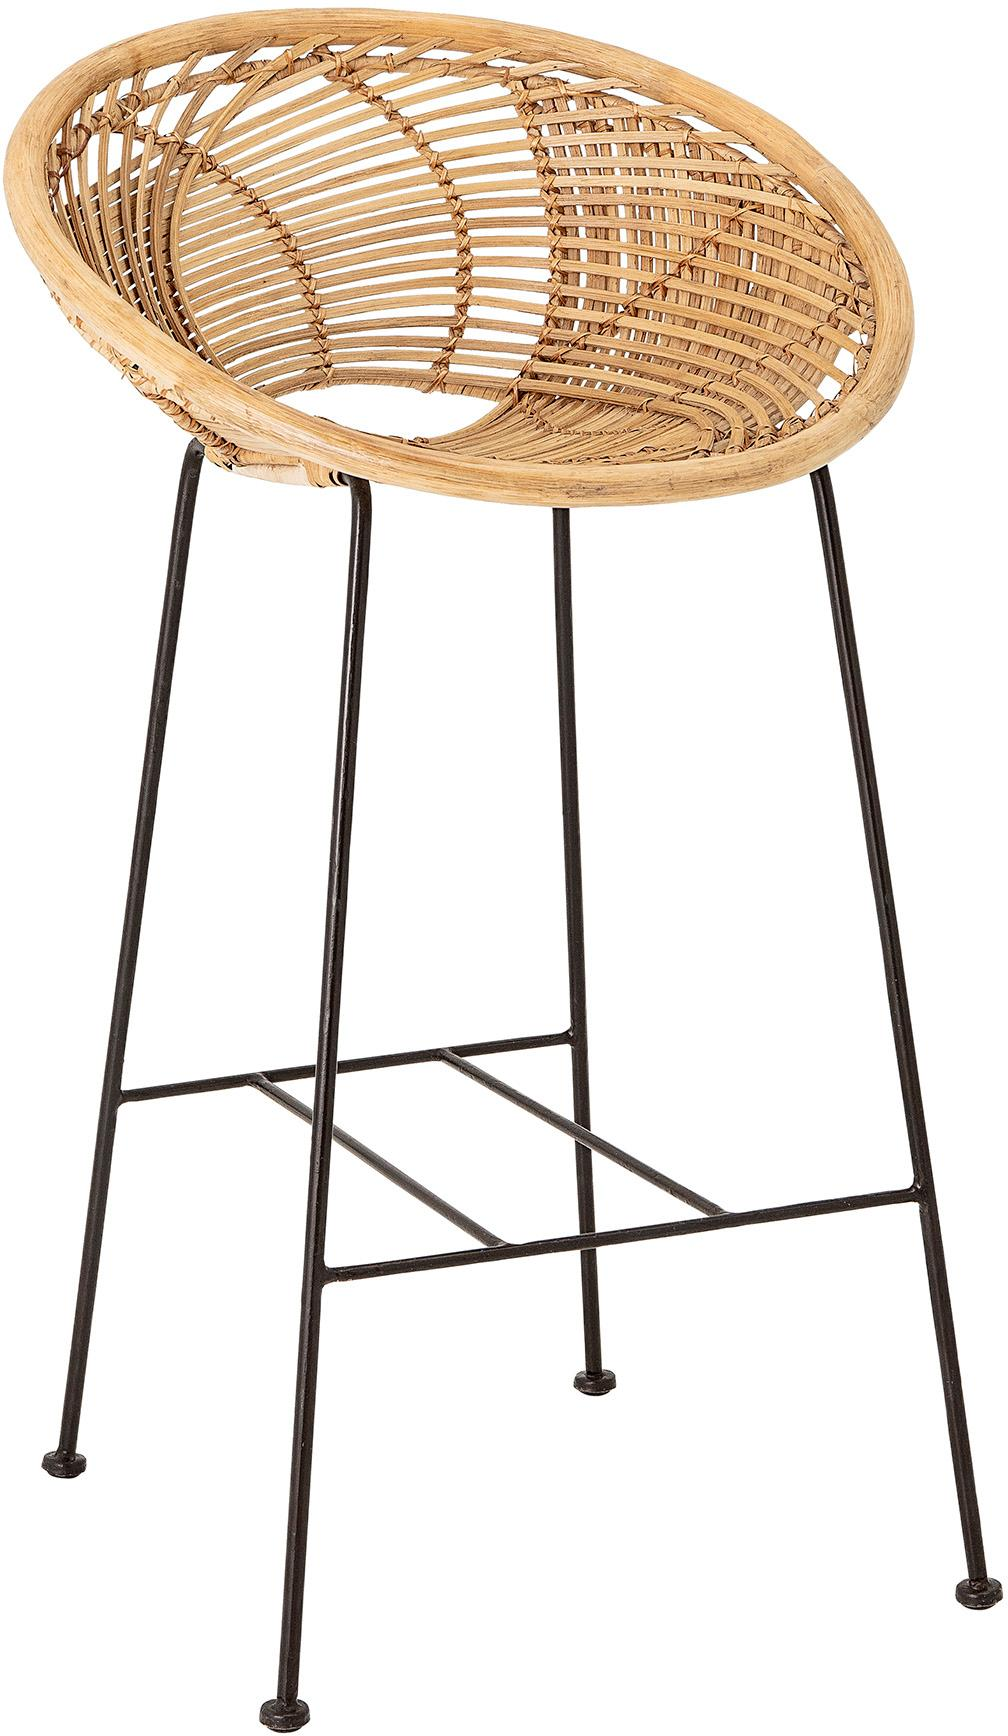 Sedia da bar in rattan Yonne, Seduta: rattan, Struttura: metallo rivestito, Rattan, nero, Larg. 52 x Alt. 94 cm